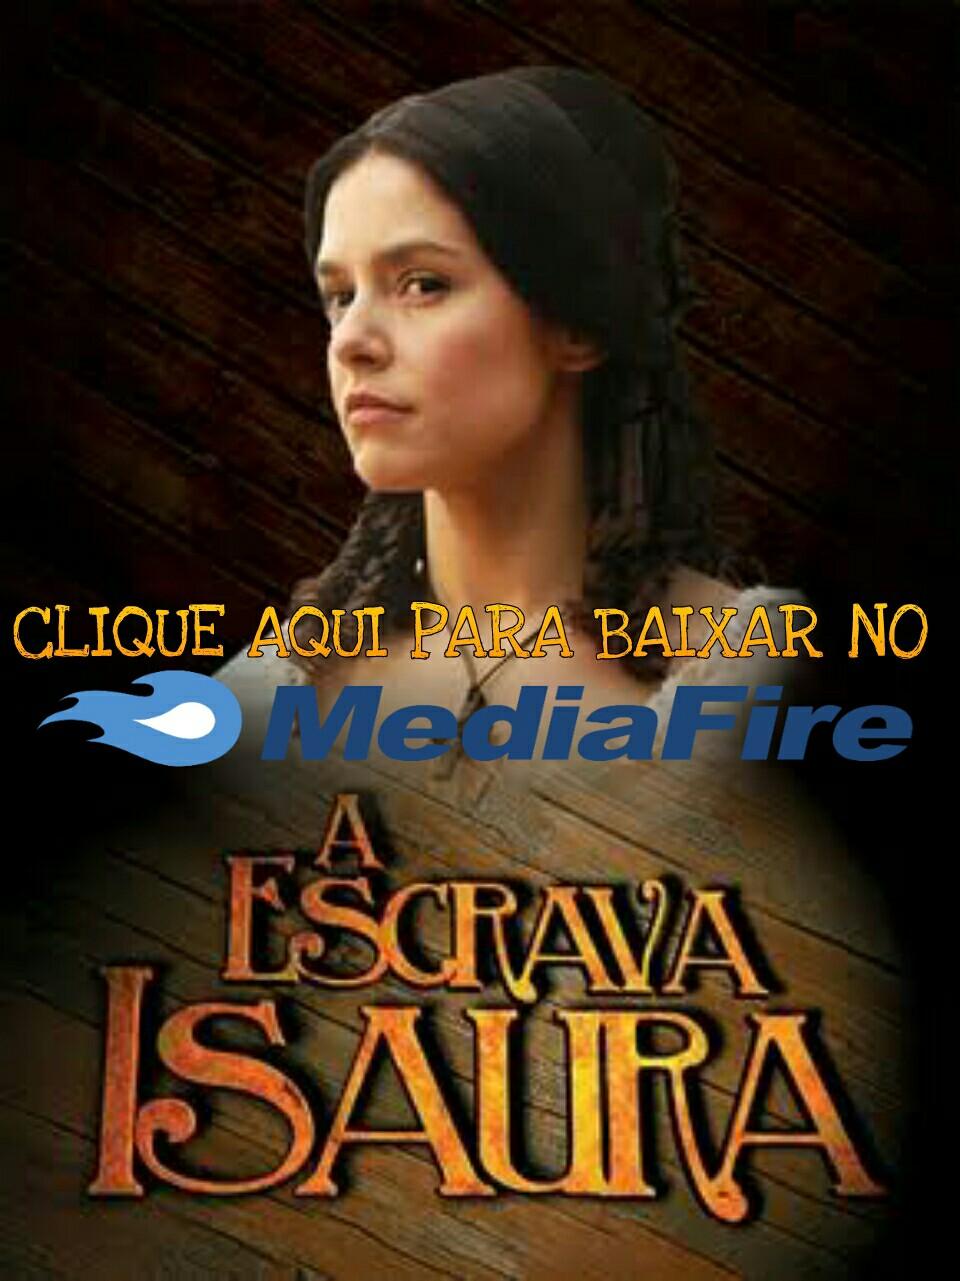 ESCRAVA MUSICA BAIXAR ISAURA